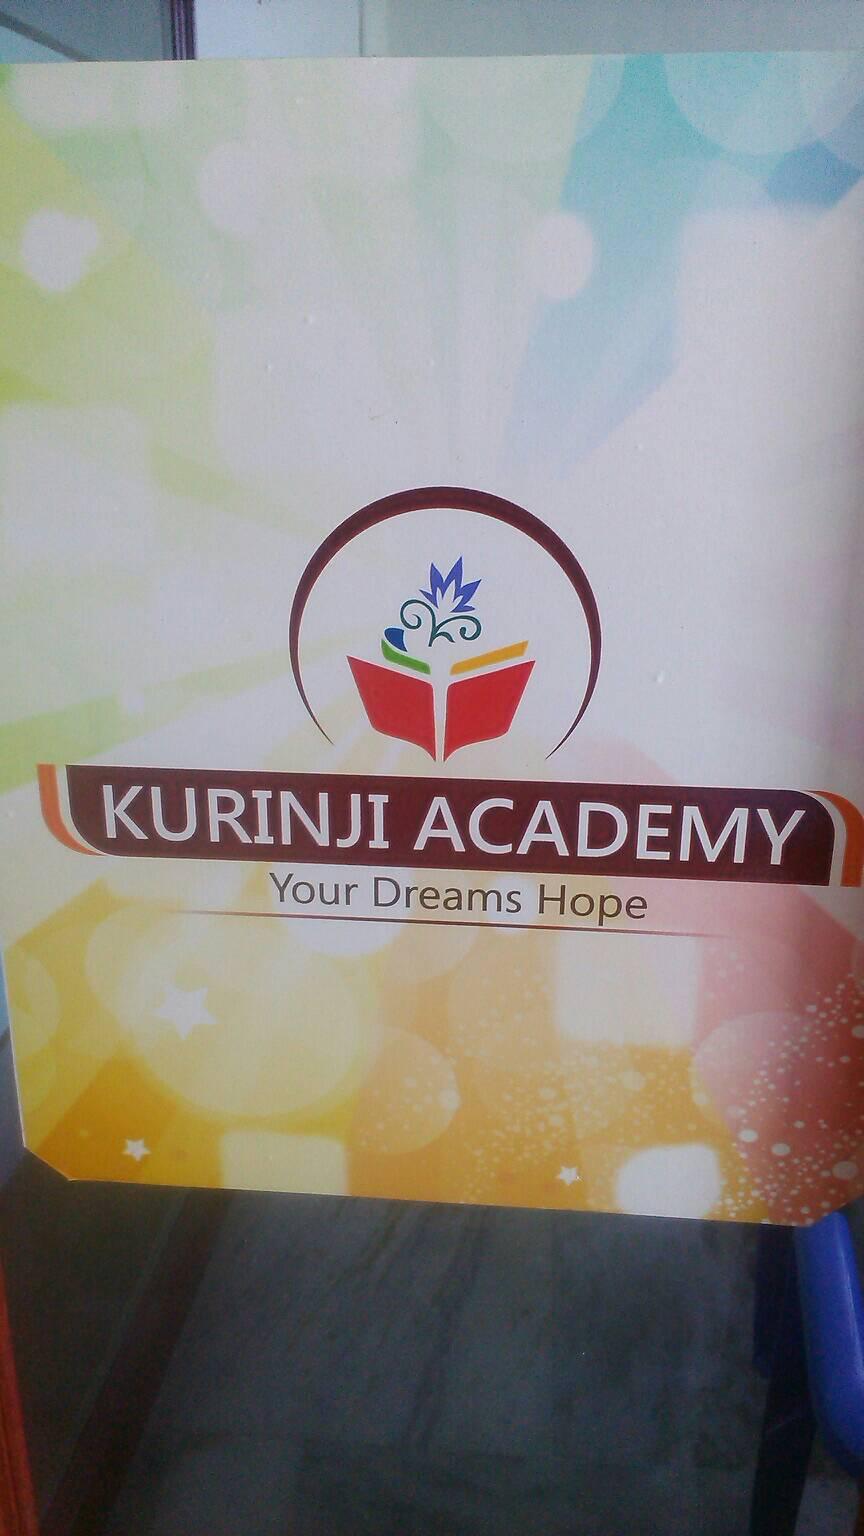 Kurinji Academy